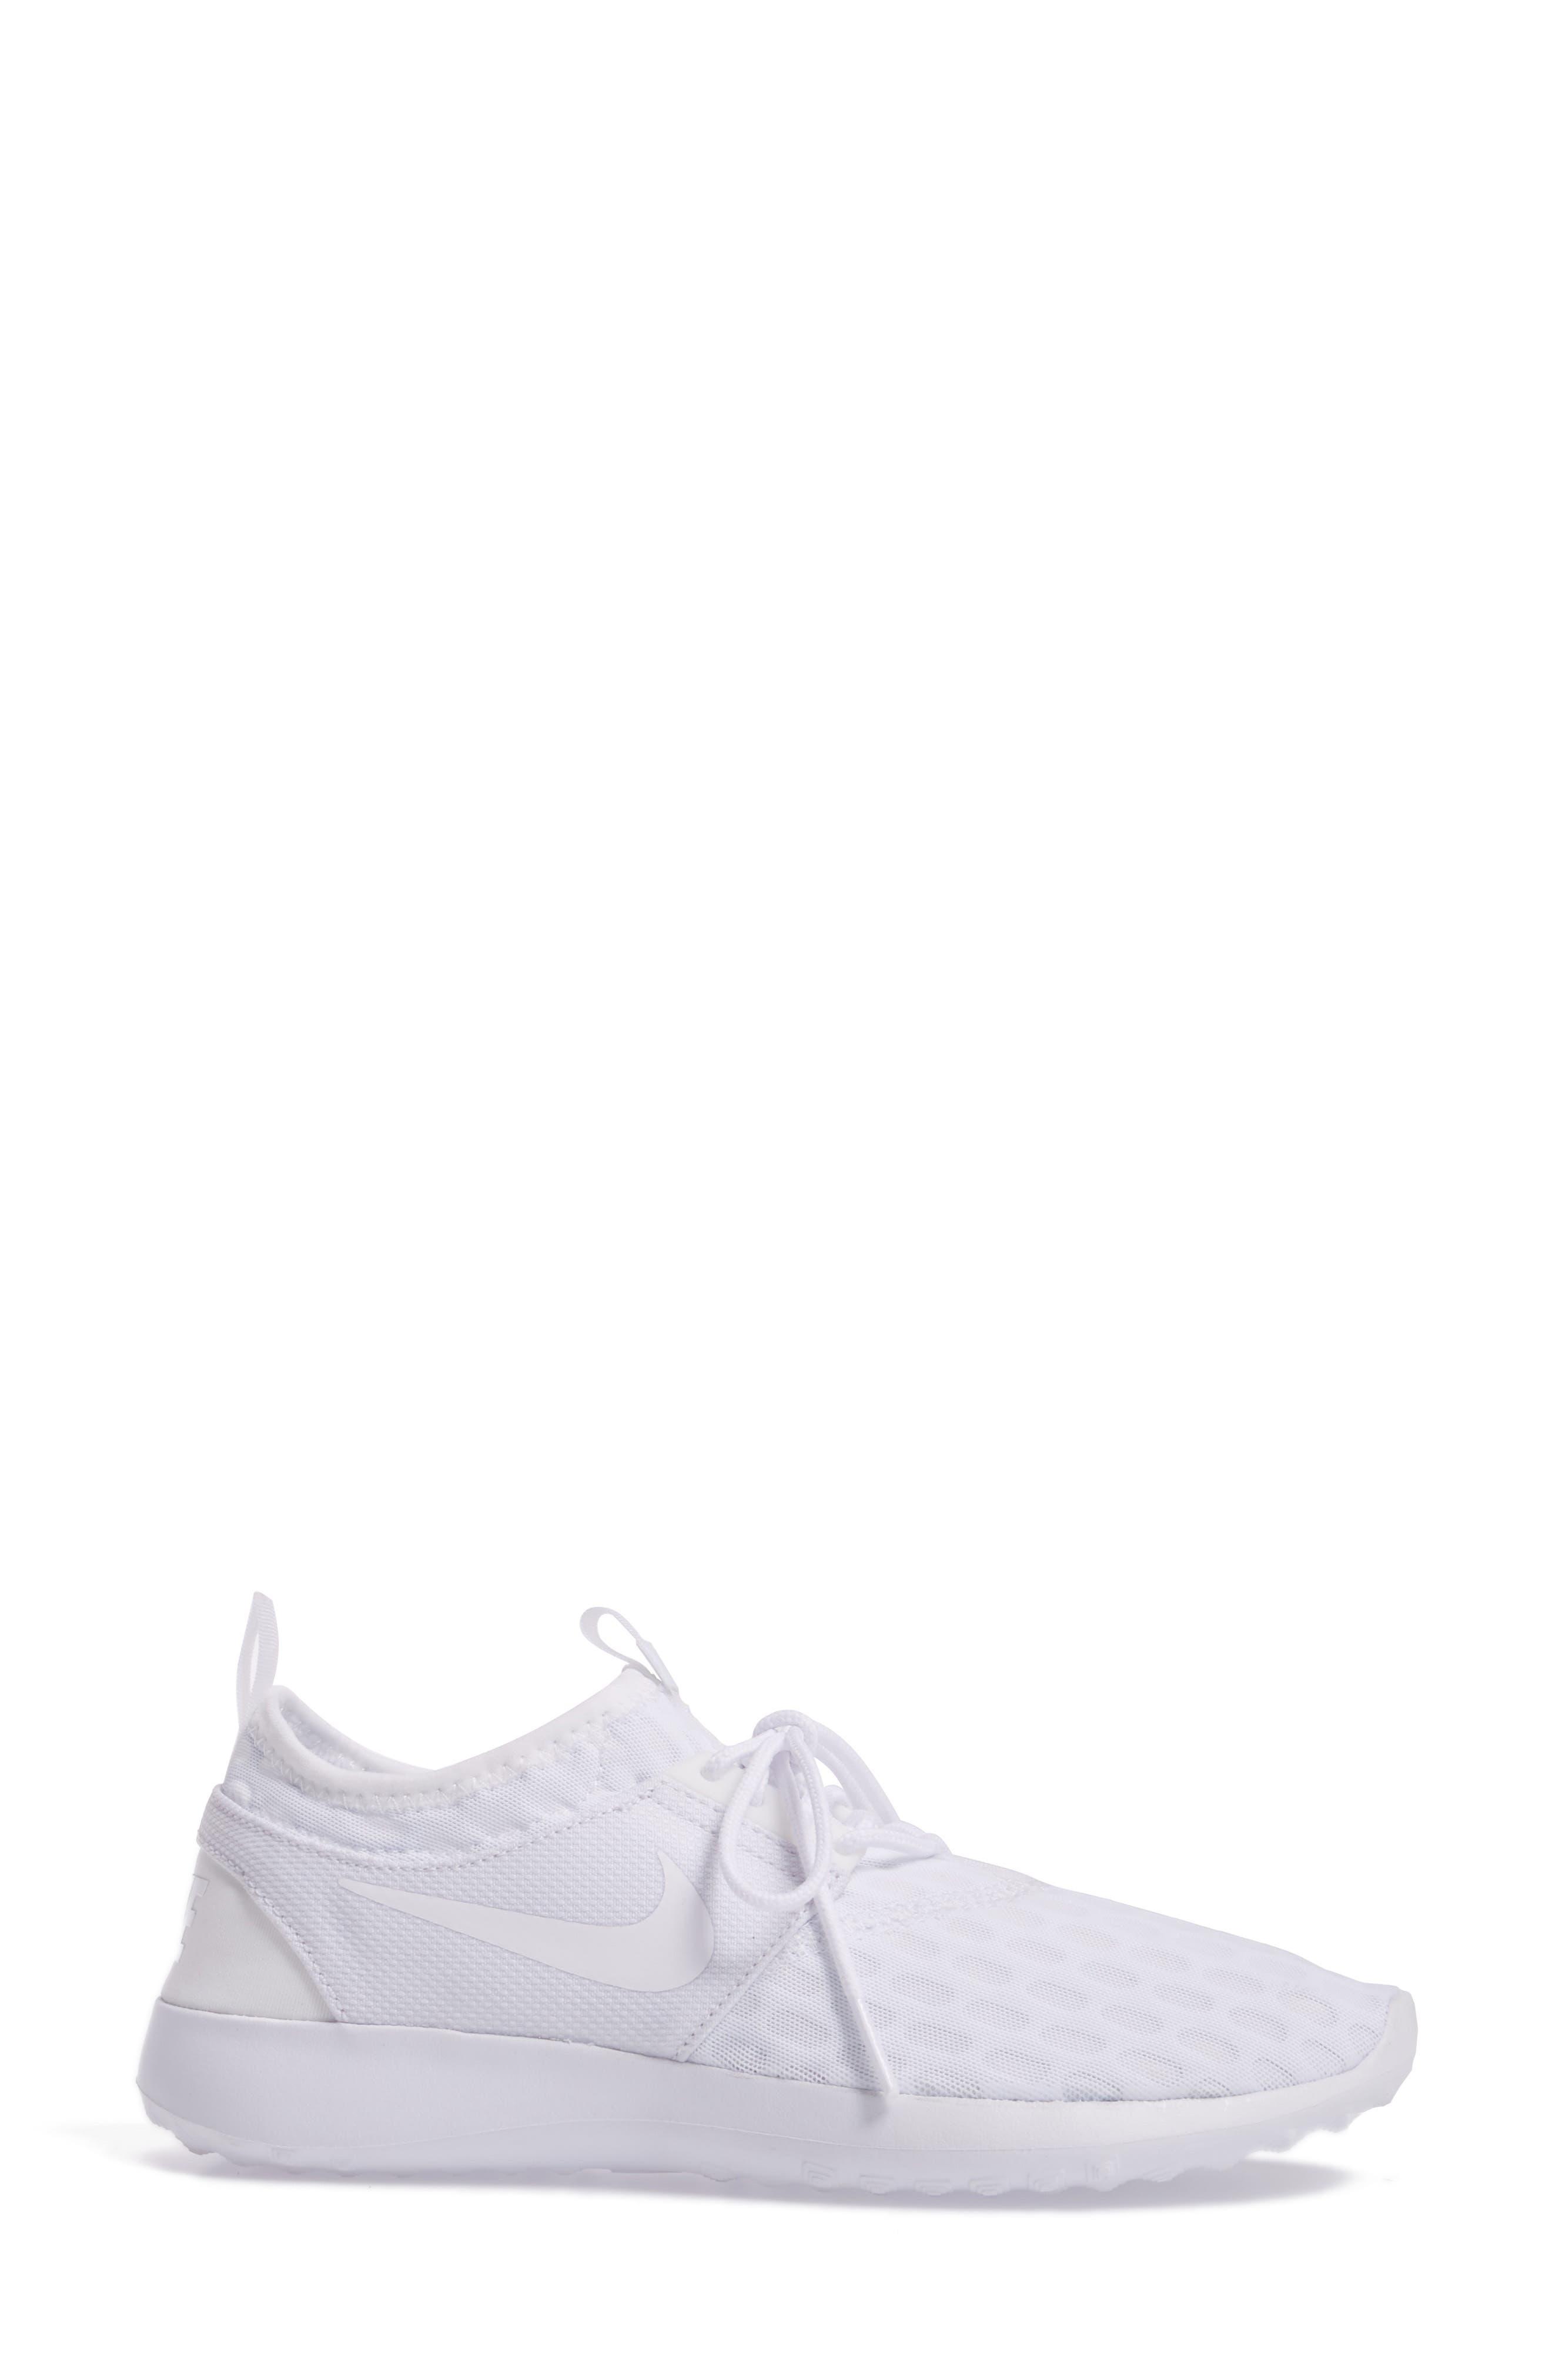 Juvenate Sneaker,                             Alternate thumbnail 134, color,